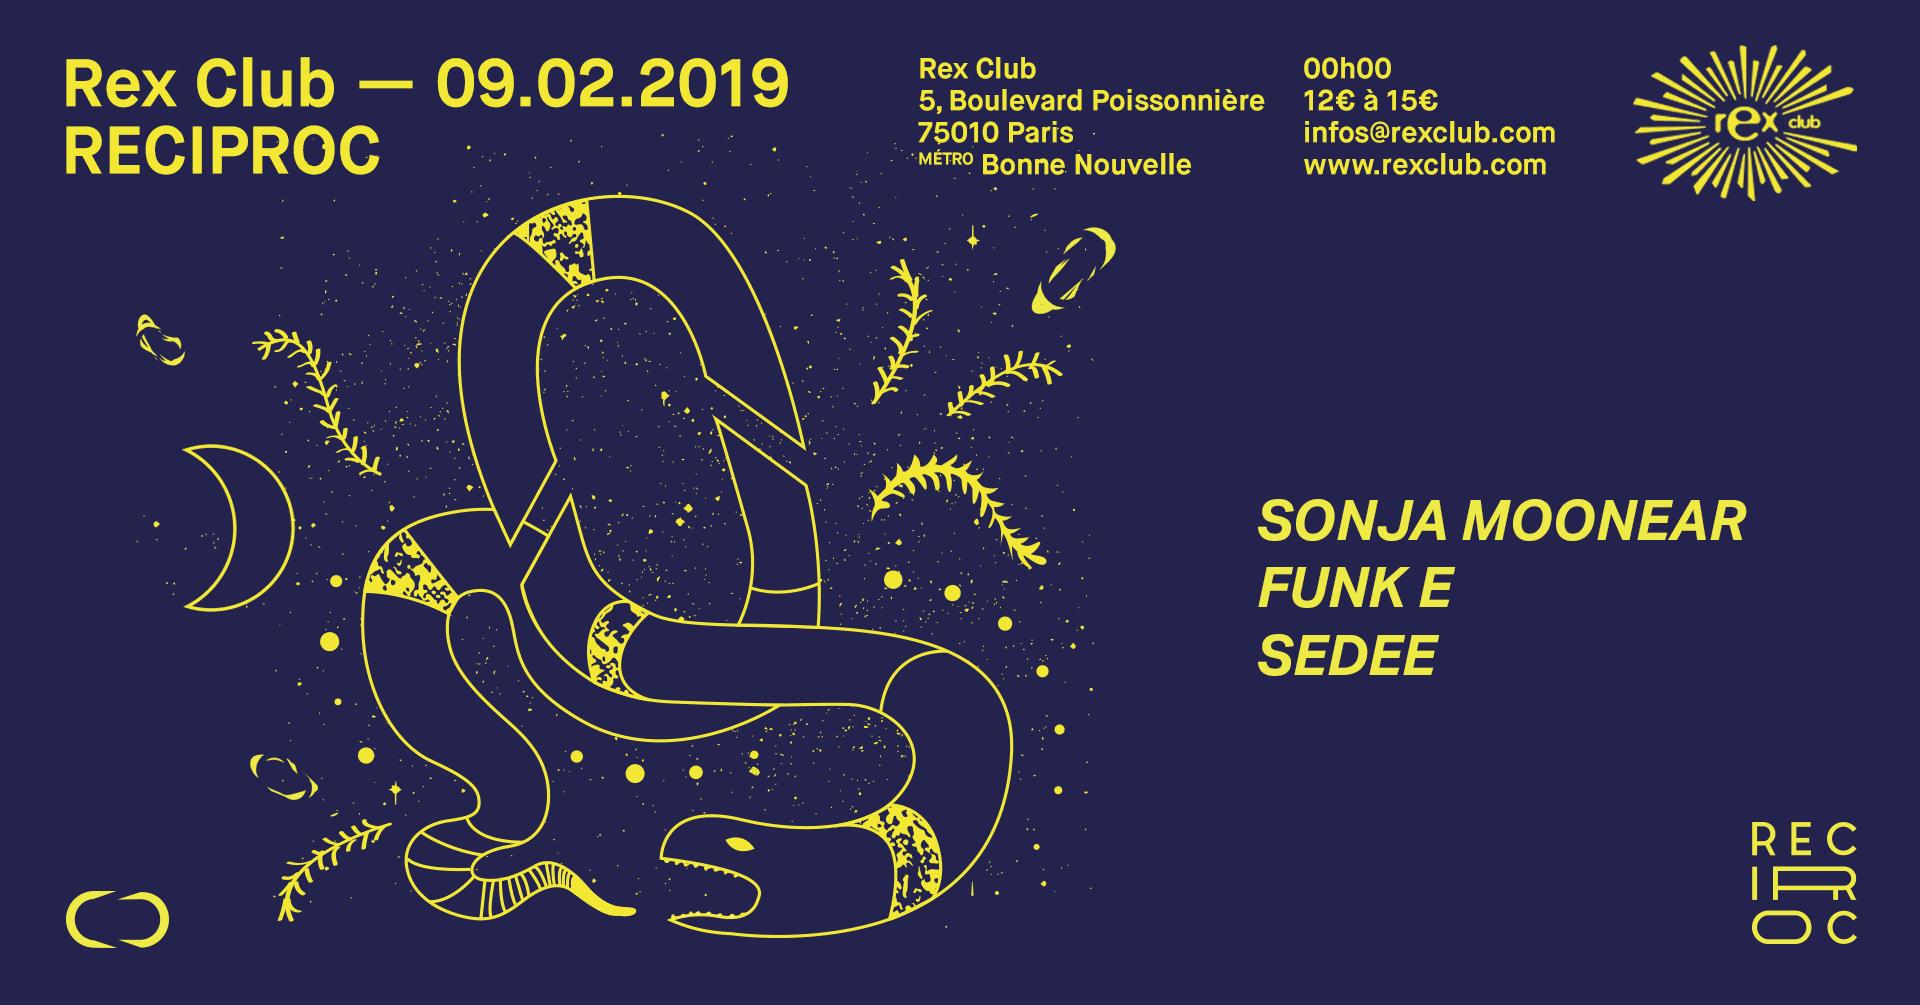 Reciproc ⋐ 5 ⋑ Sonja Moonear, Funk E, Sedee